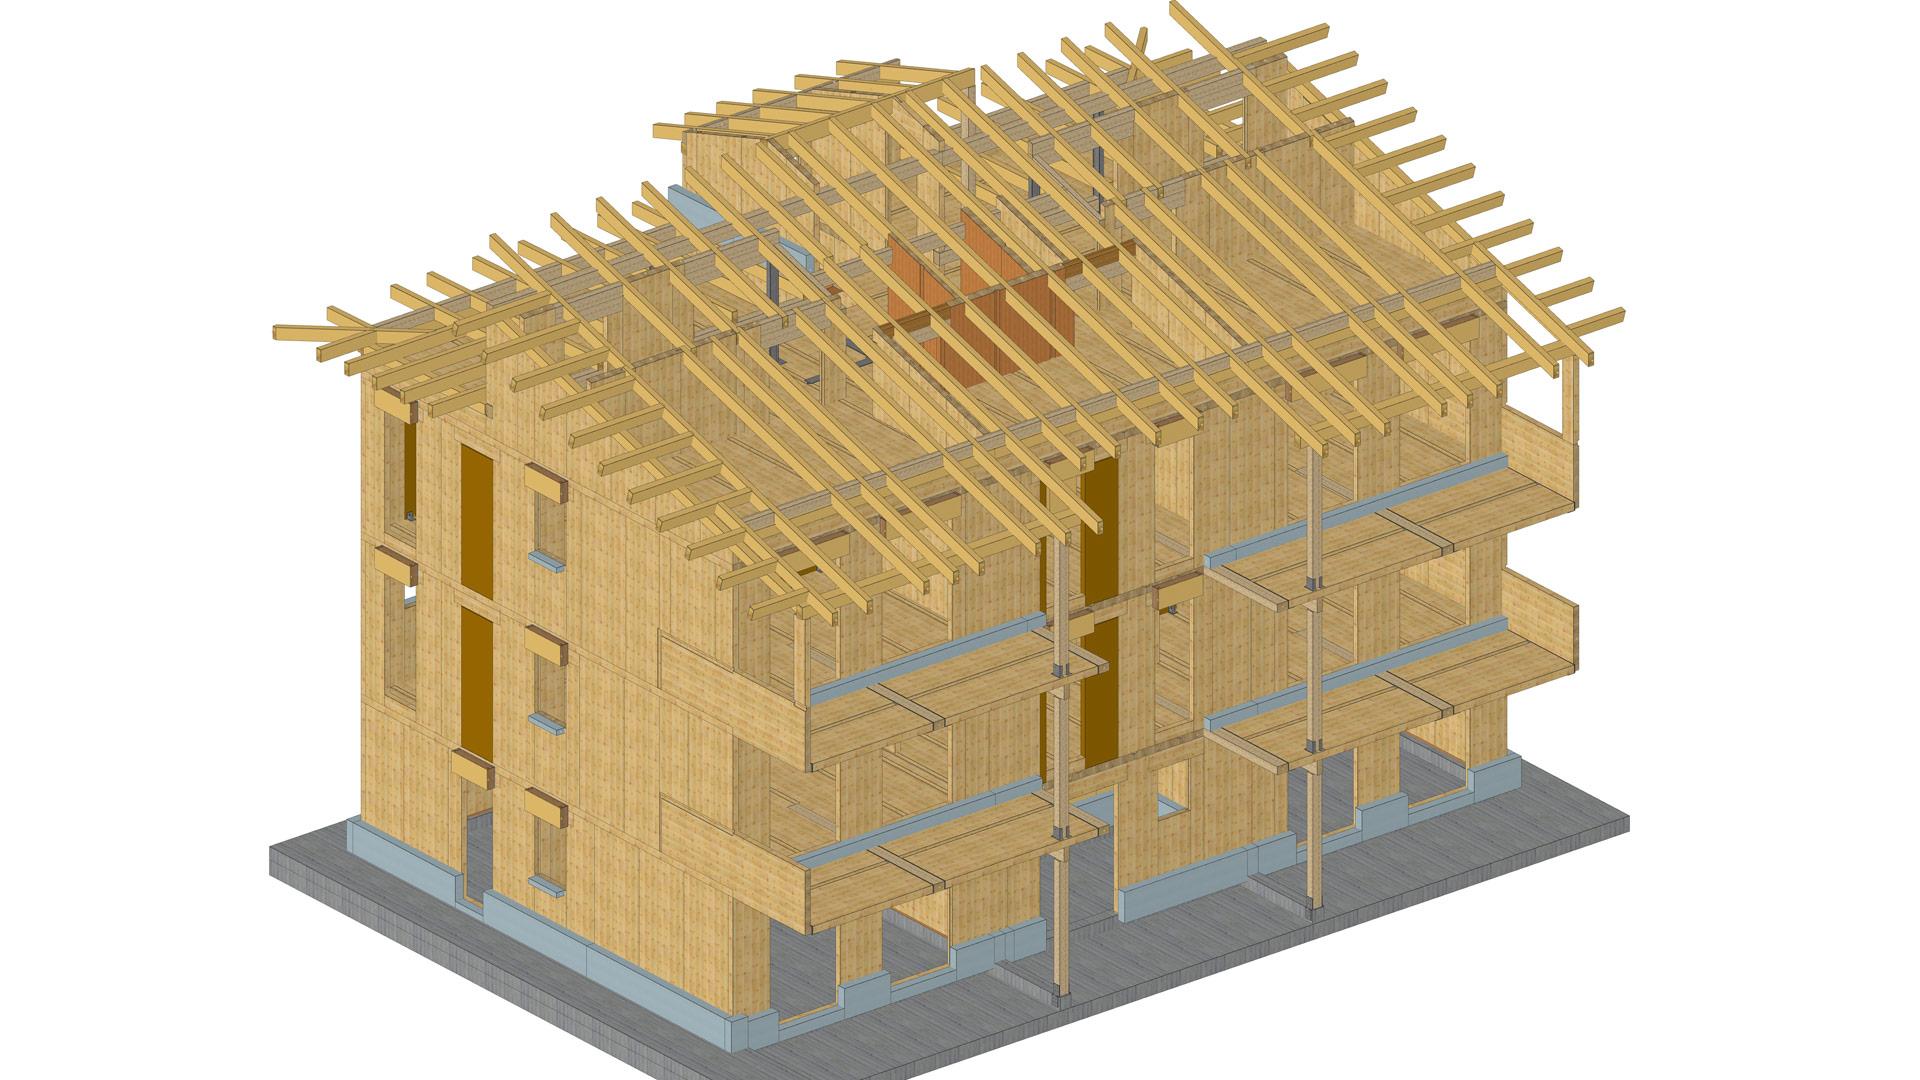 Palazzine legno xlam a fossano cuneo cohousing sociale for Case in legno xlam